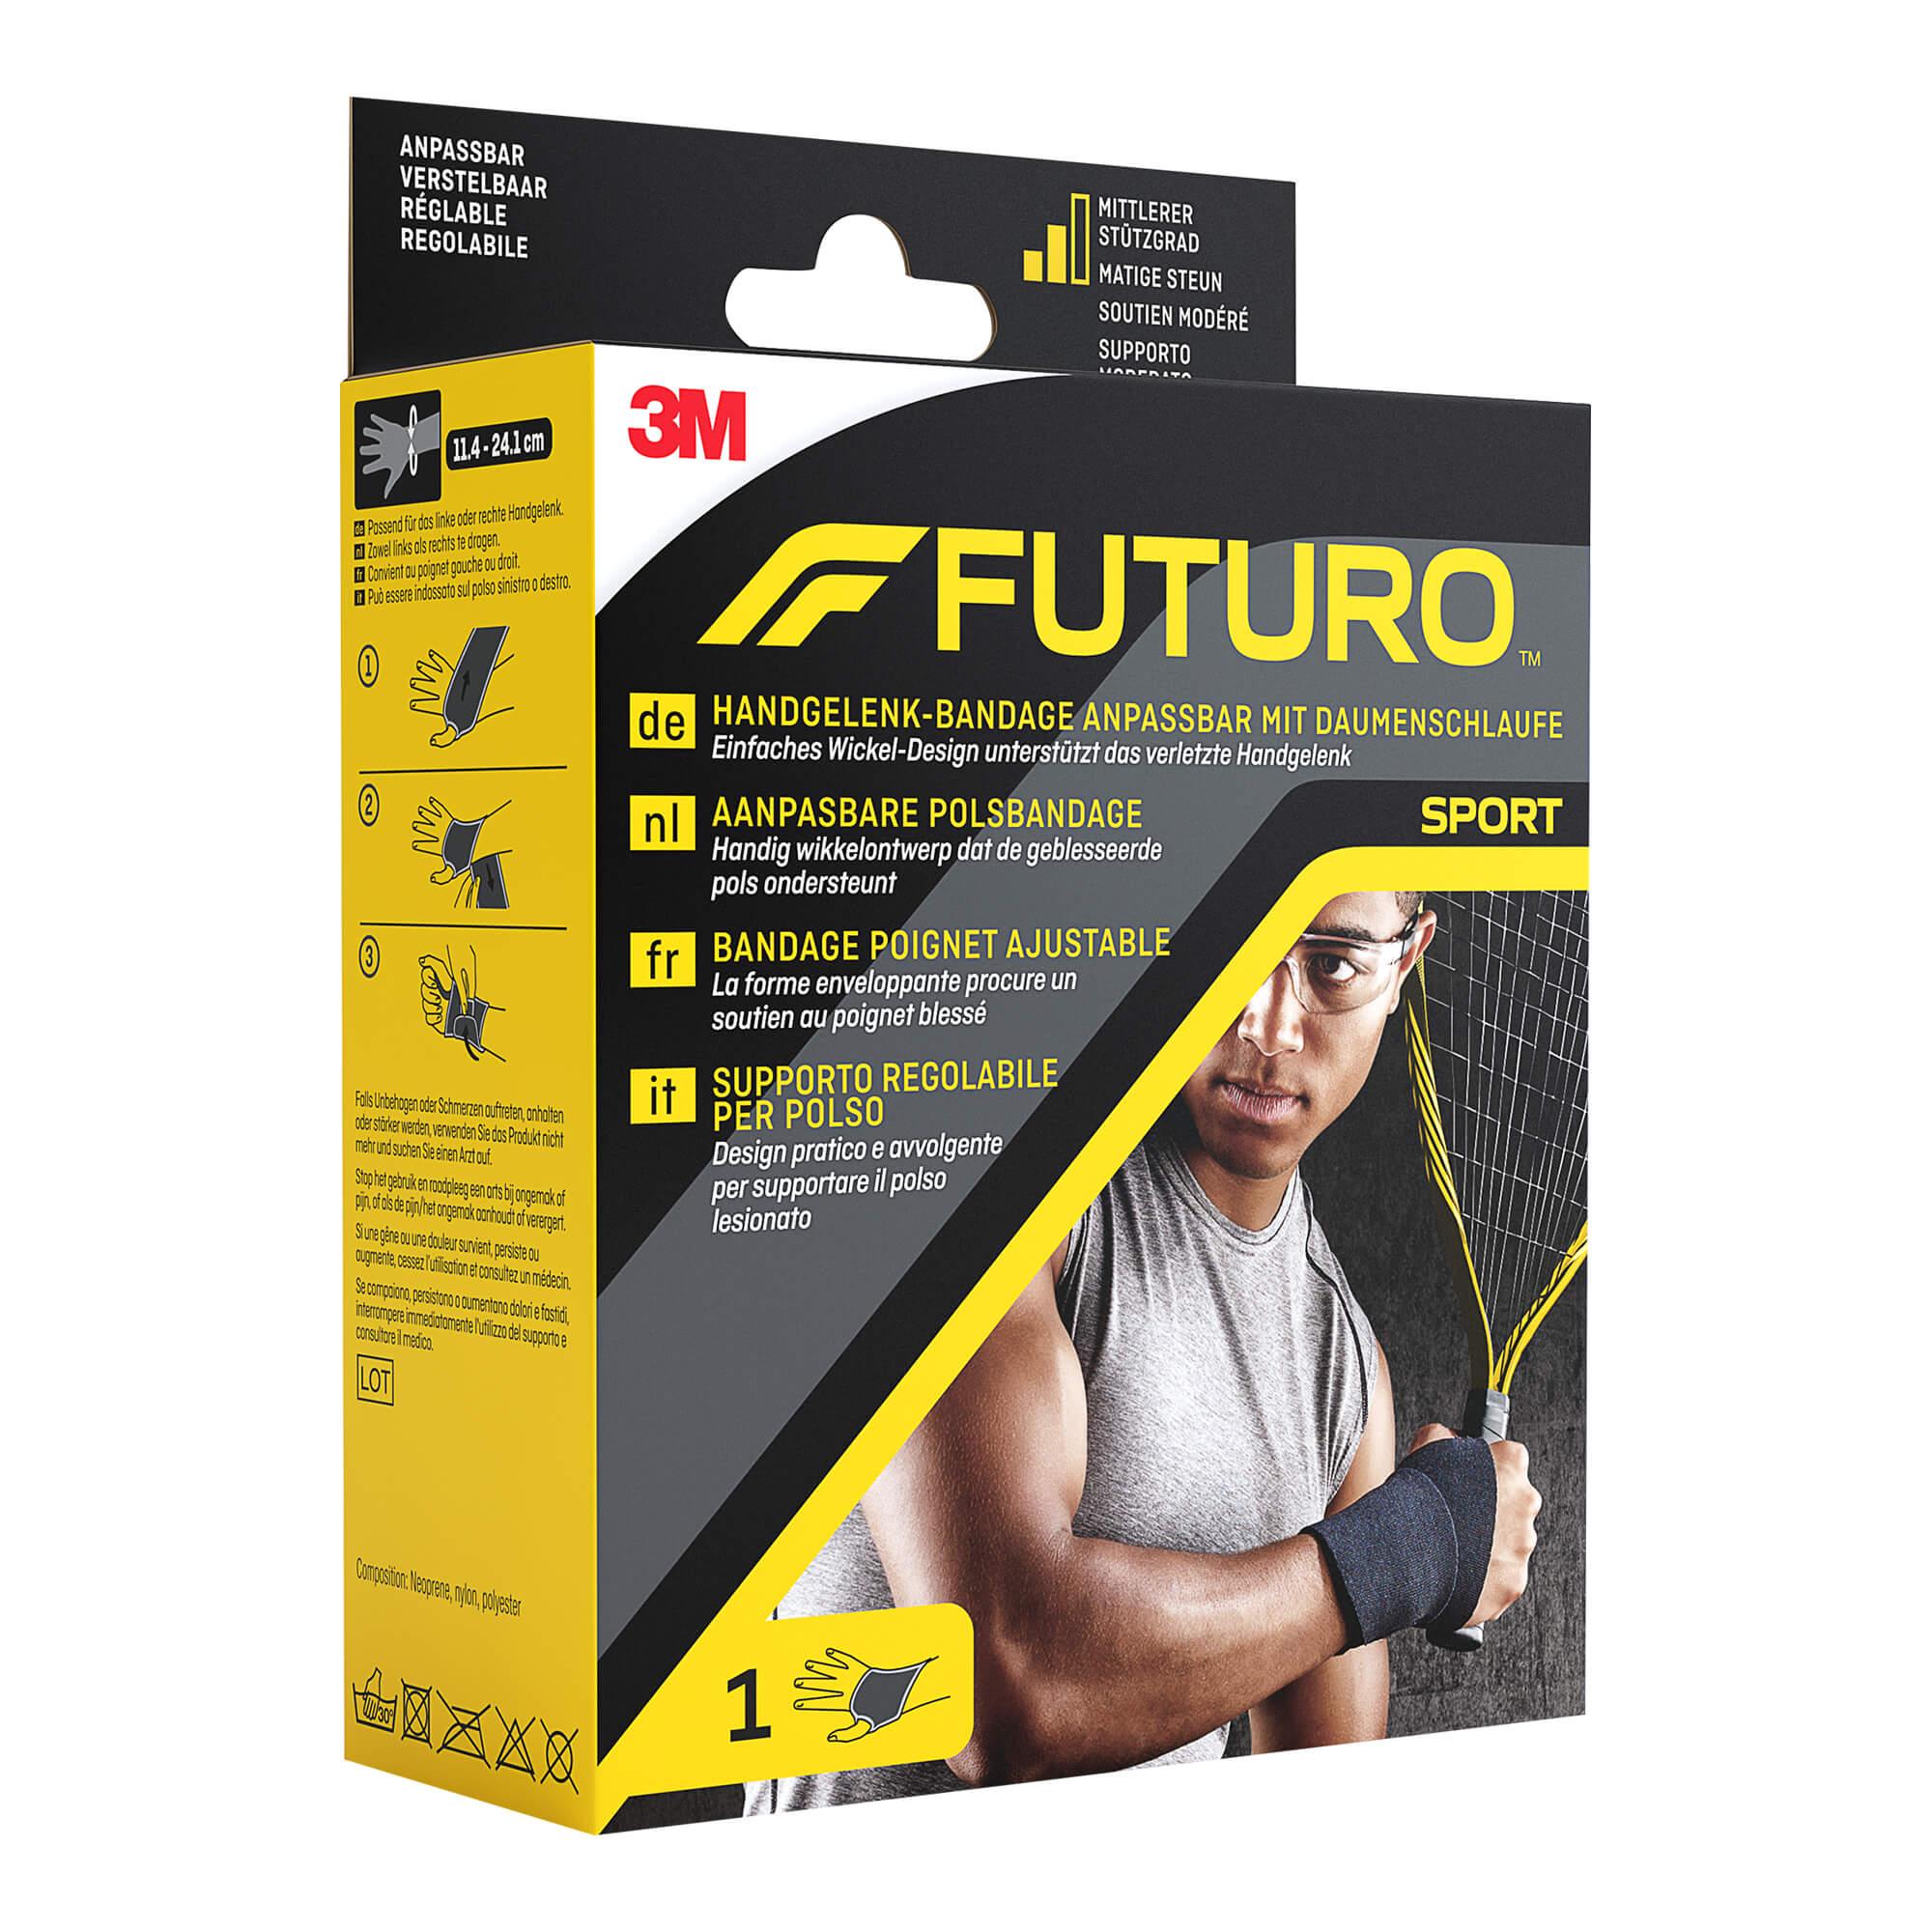 Futuro Sport Handgelenk-Bandage